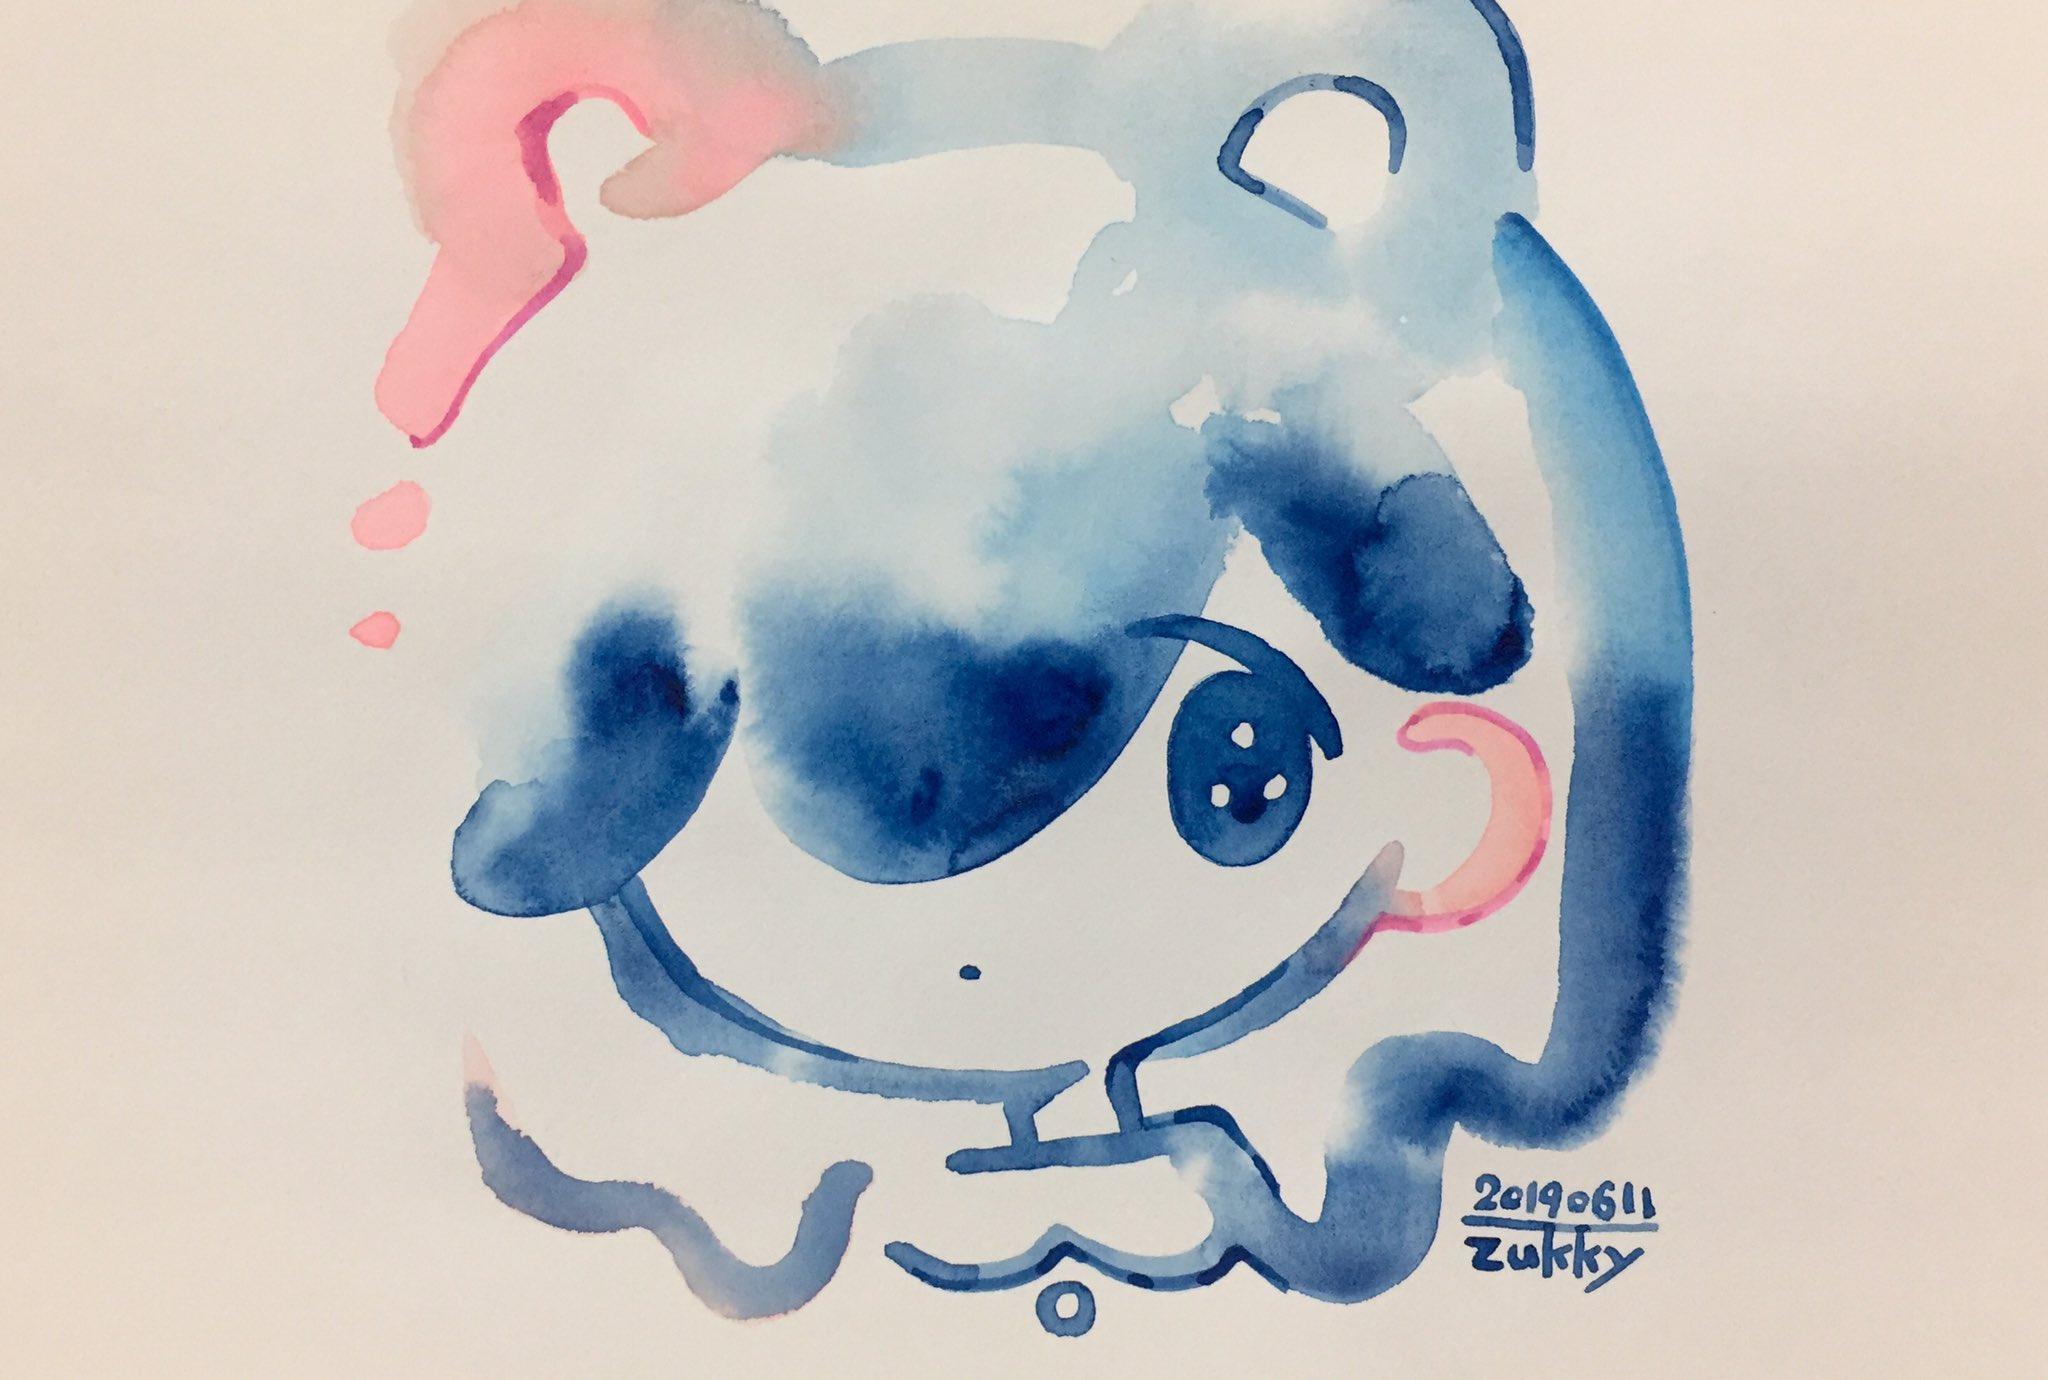 Anime Girl 2048x1380